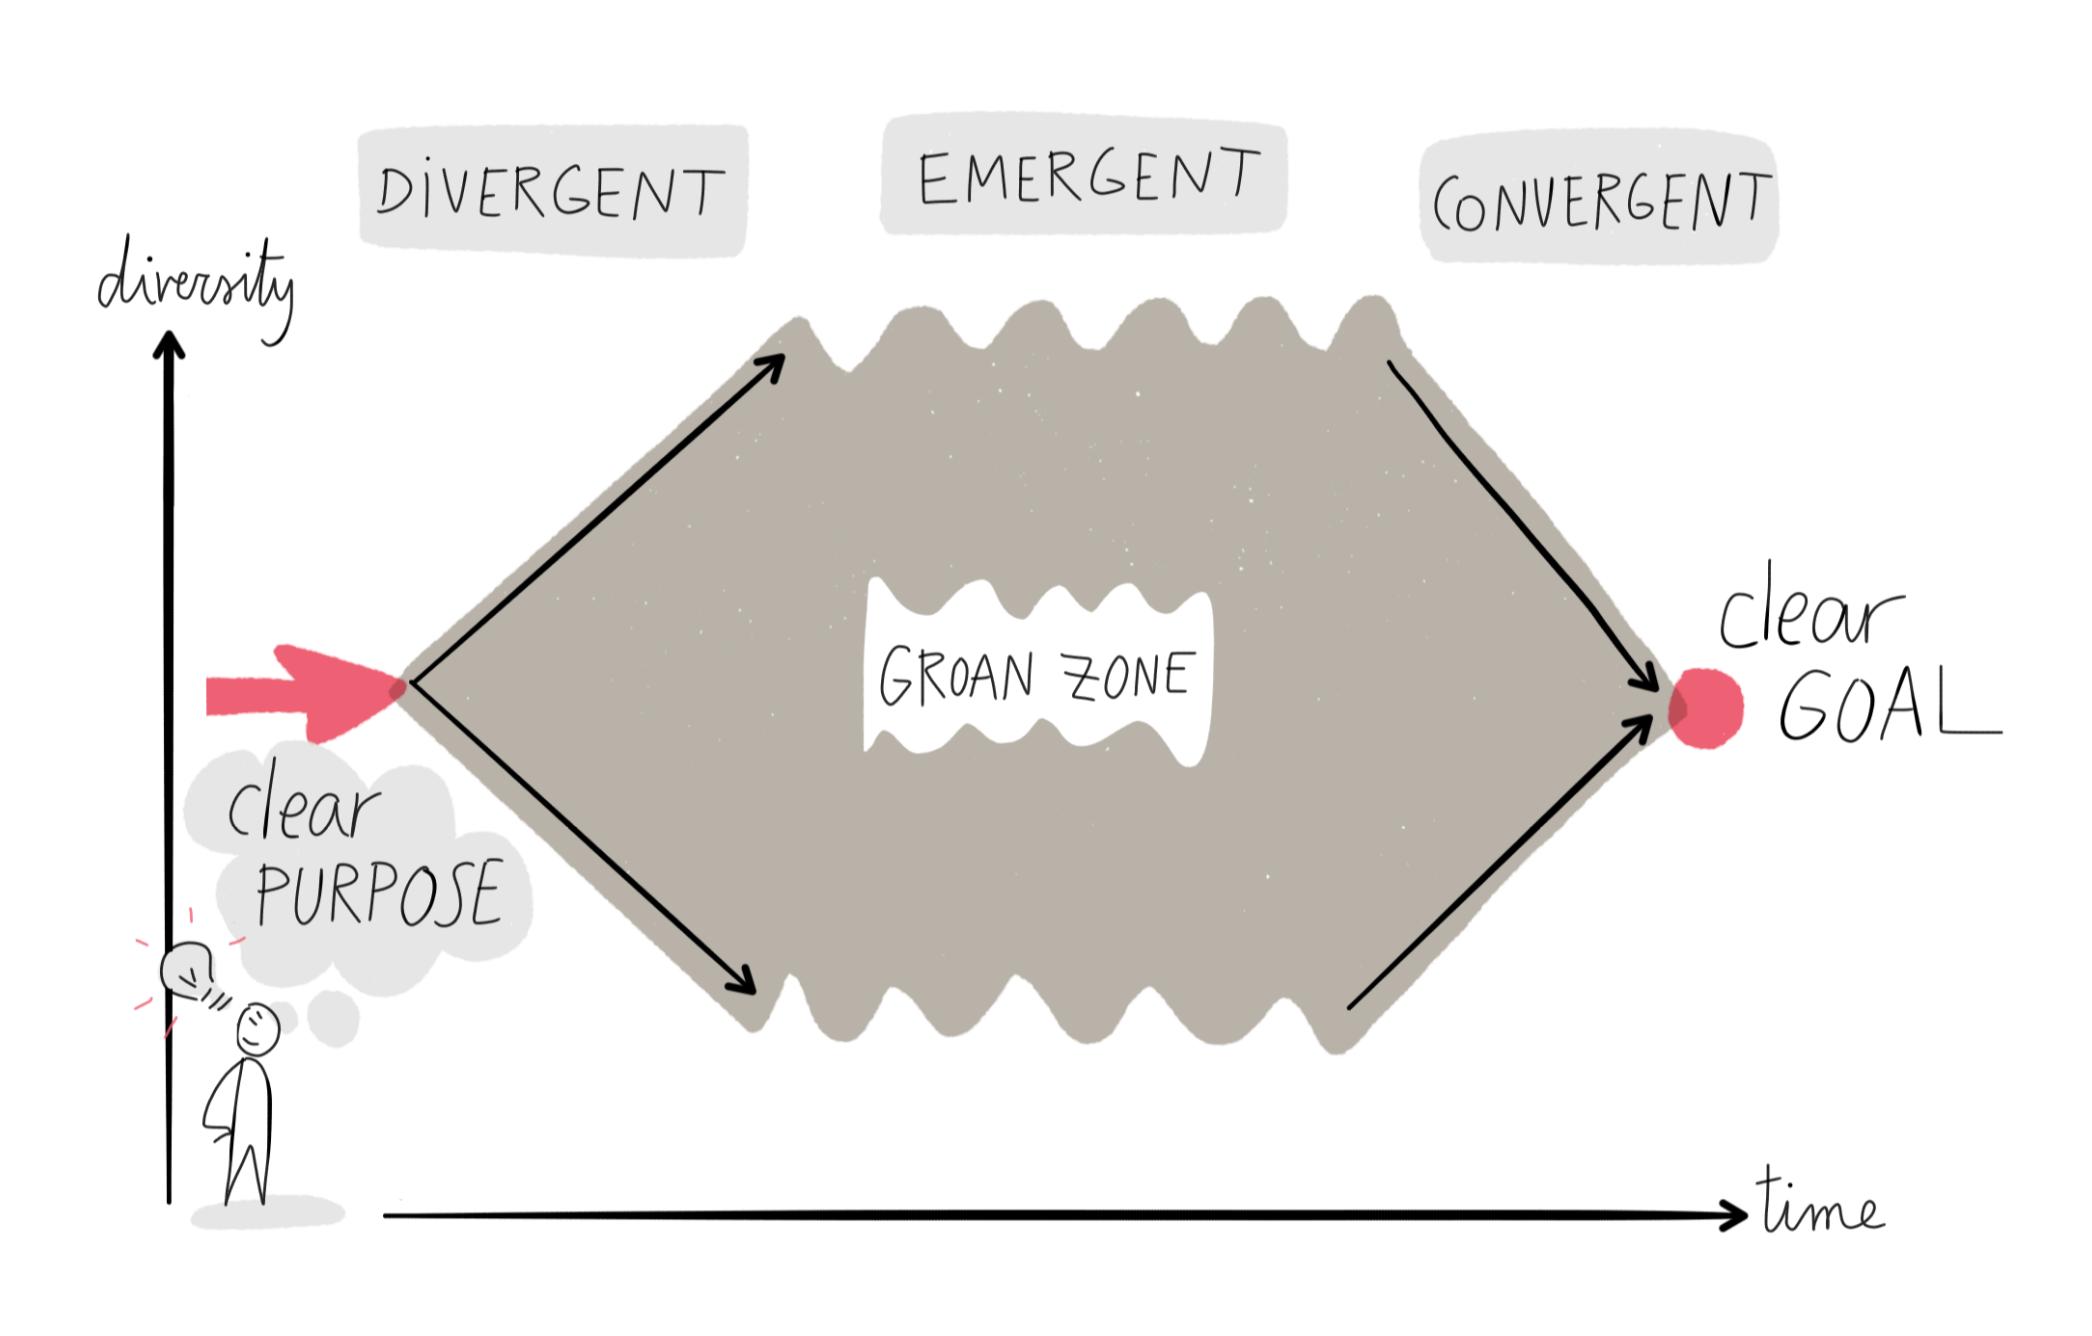 Graphic by Lara Listens (www.LaraListens.eu)